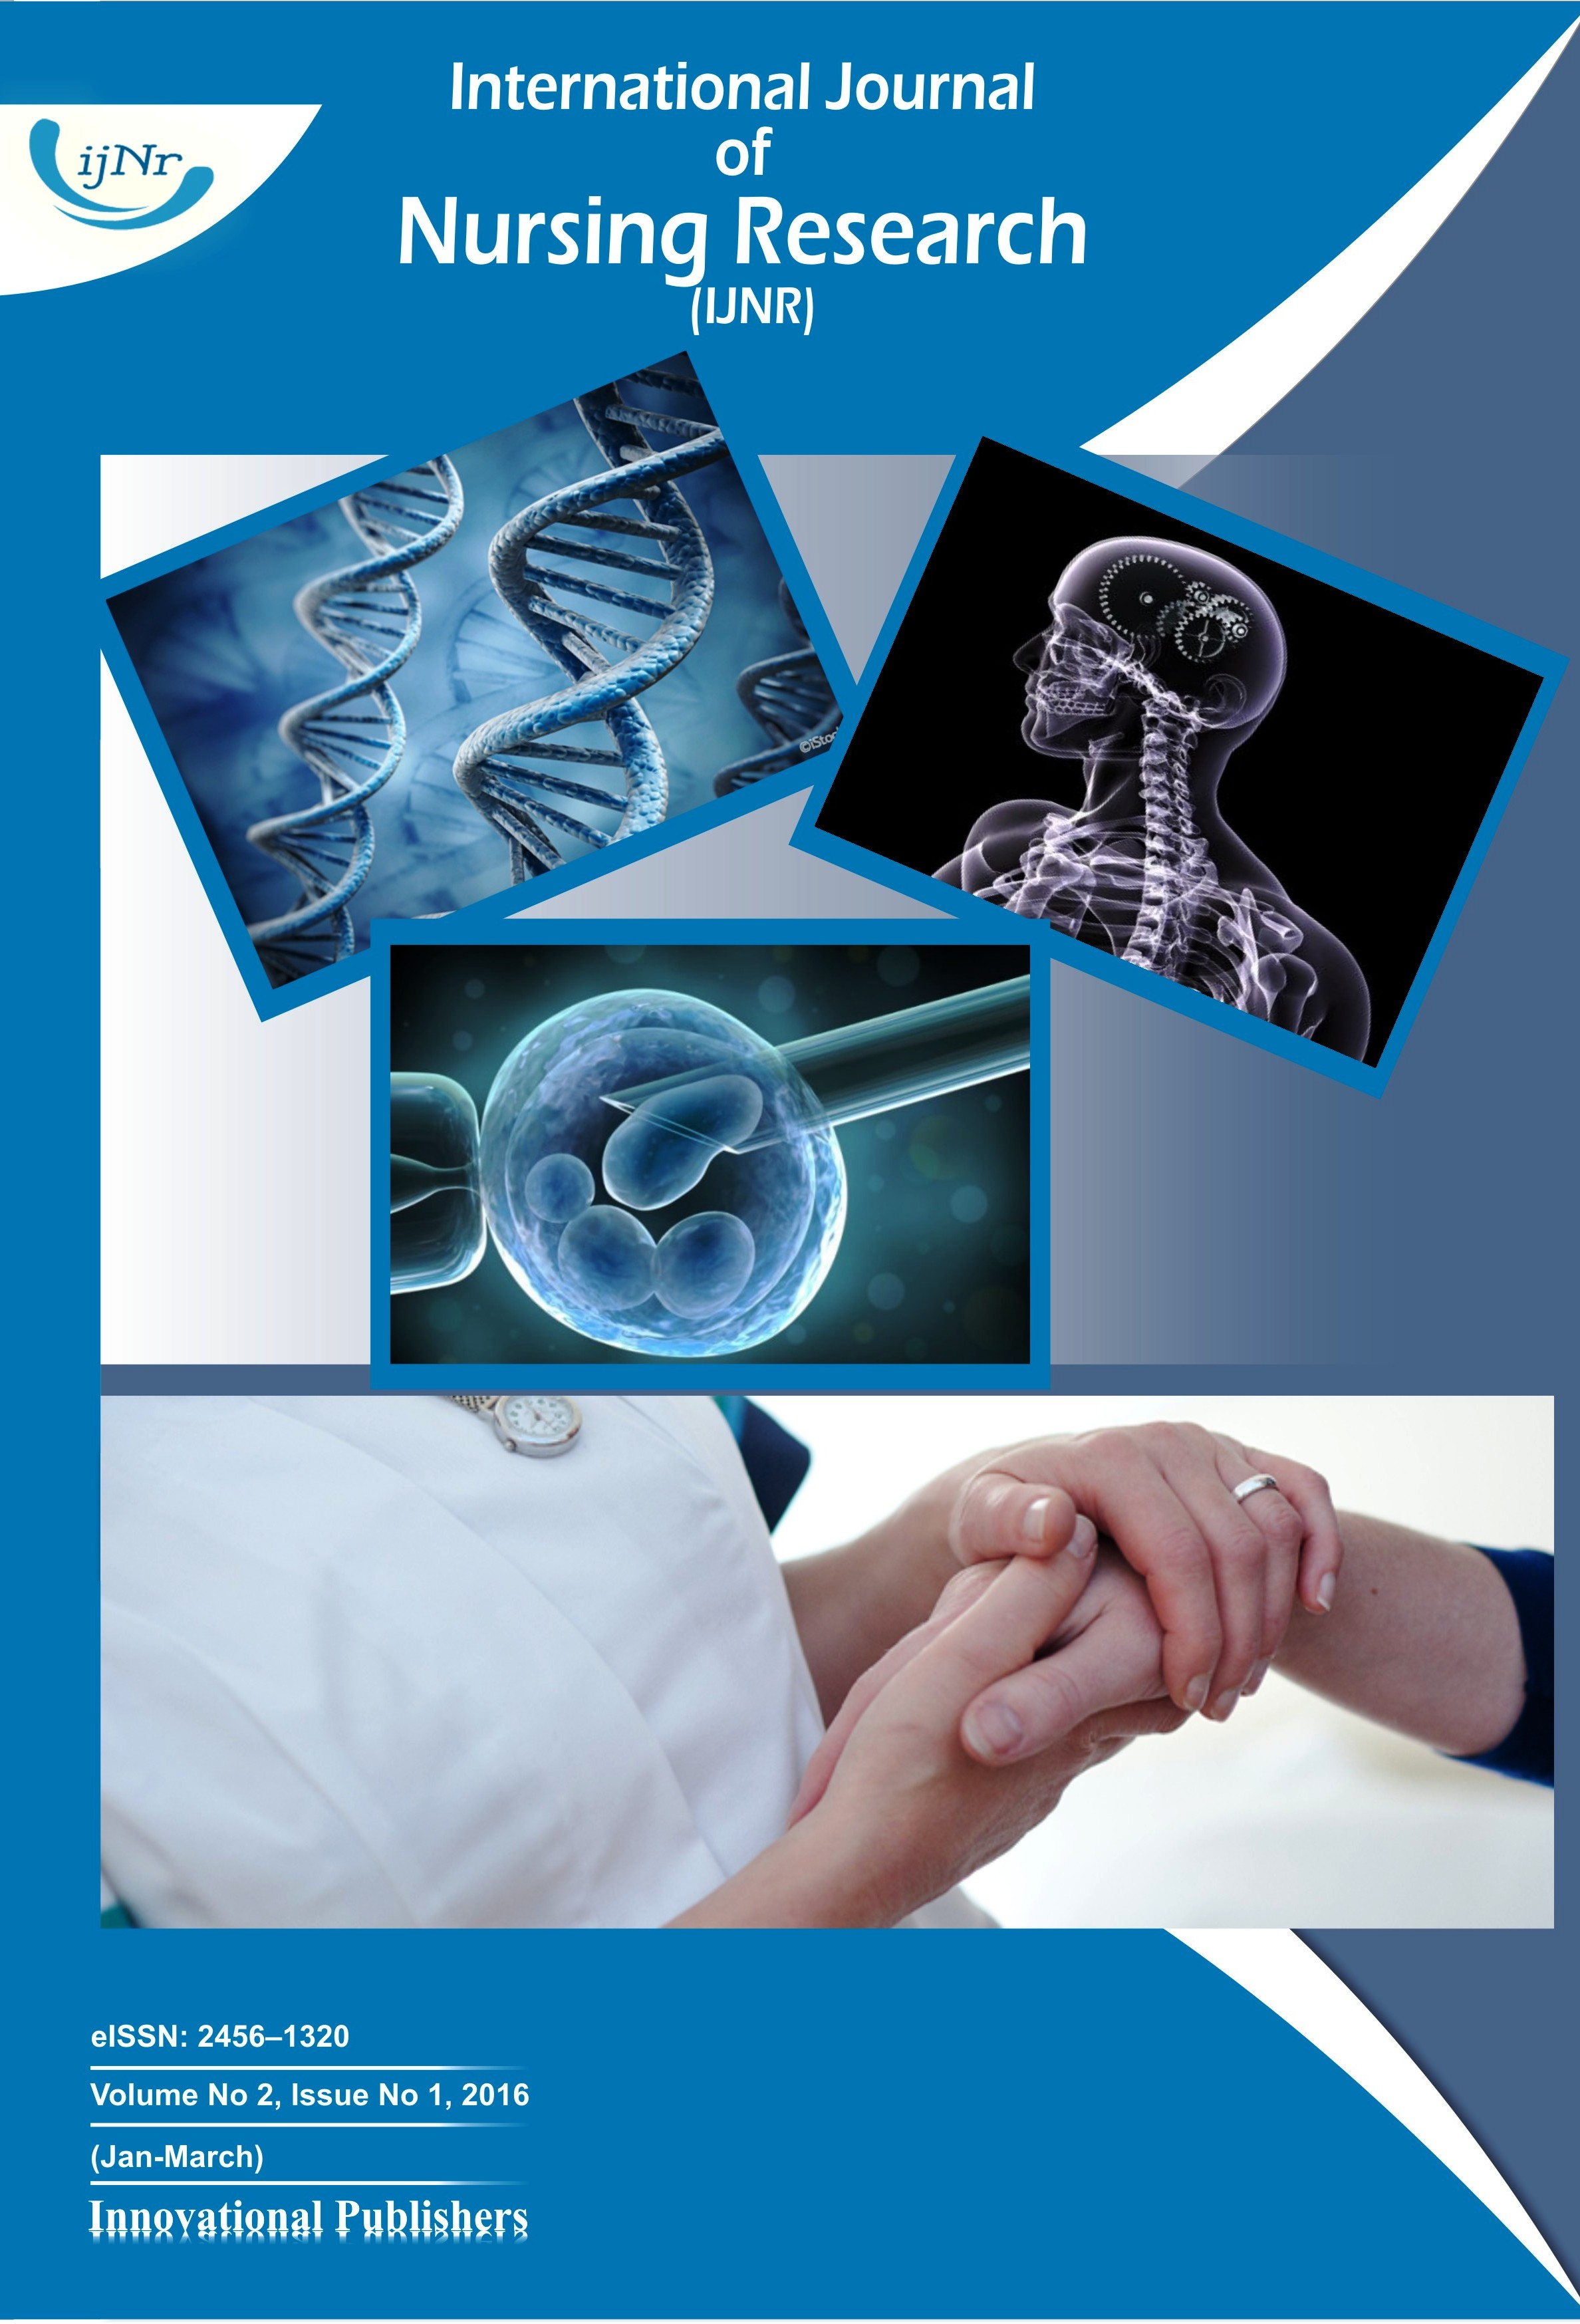 International Journal of Nursing Research (IJNR)